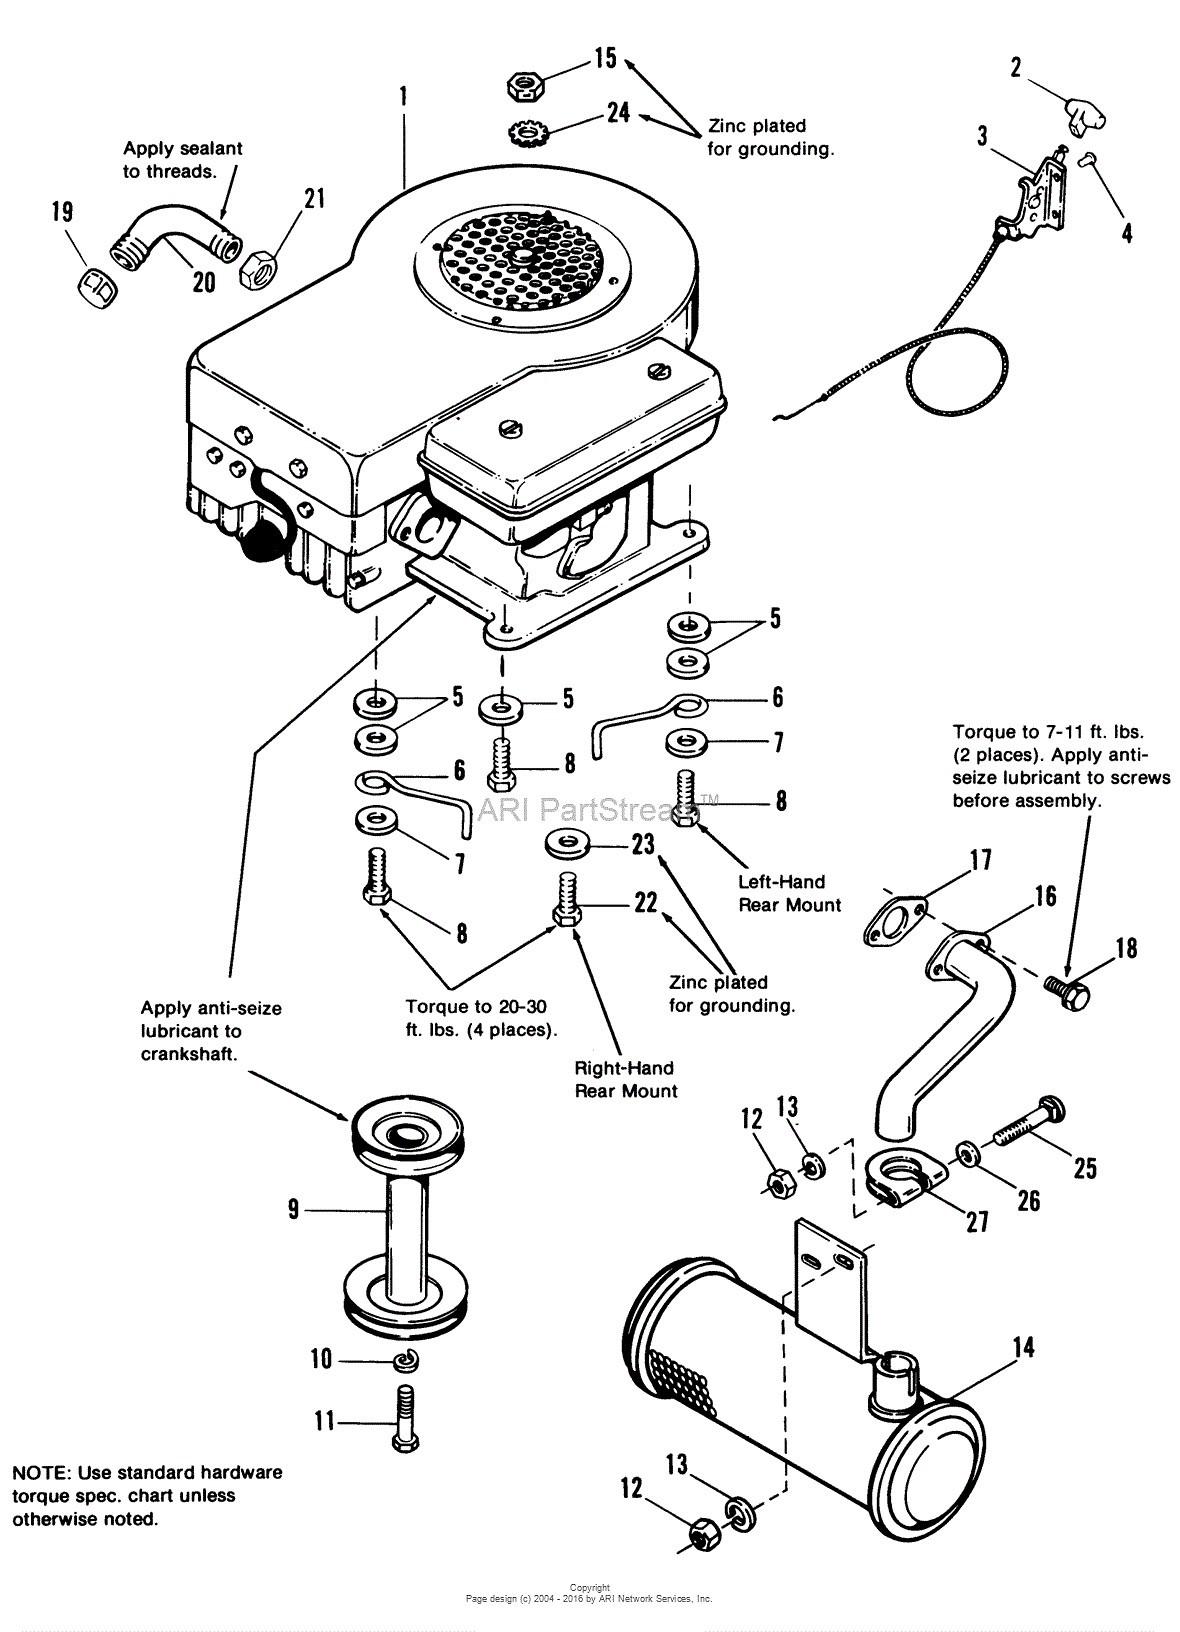 Parts for 17.5 Briggs Stratton Engine Briggs and Stratton 17 5 Hp Engine Diagram Of Parts for 17.5 Briggs Stratton Engine